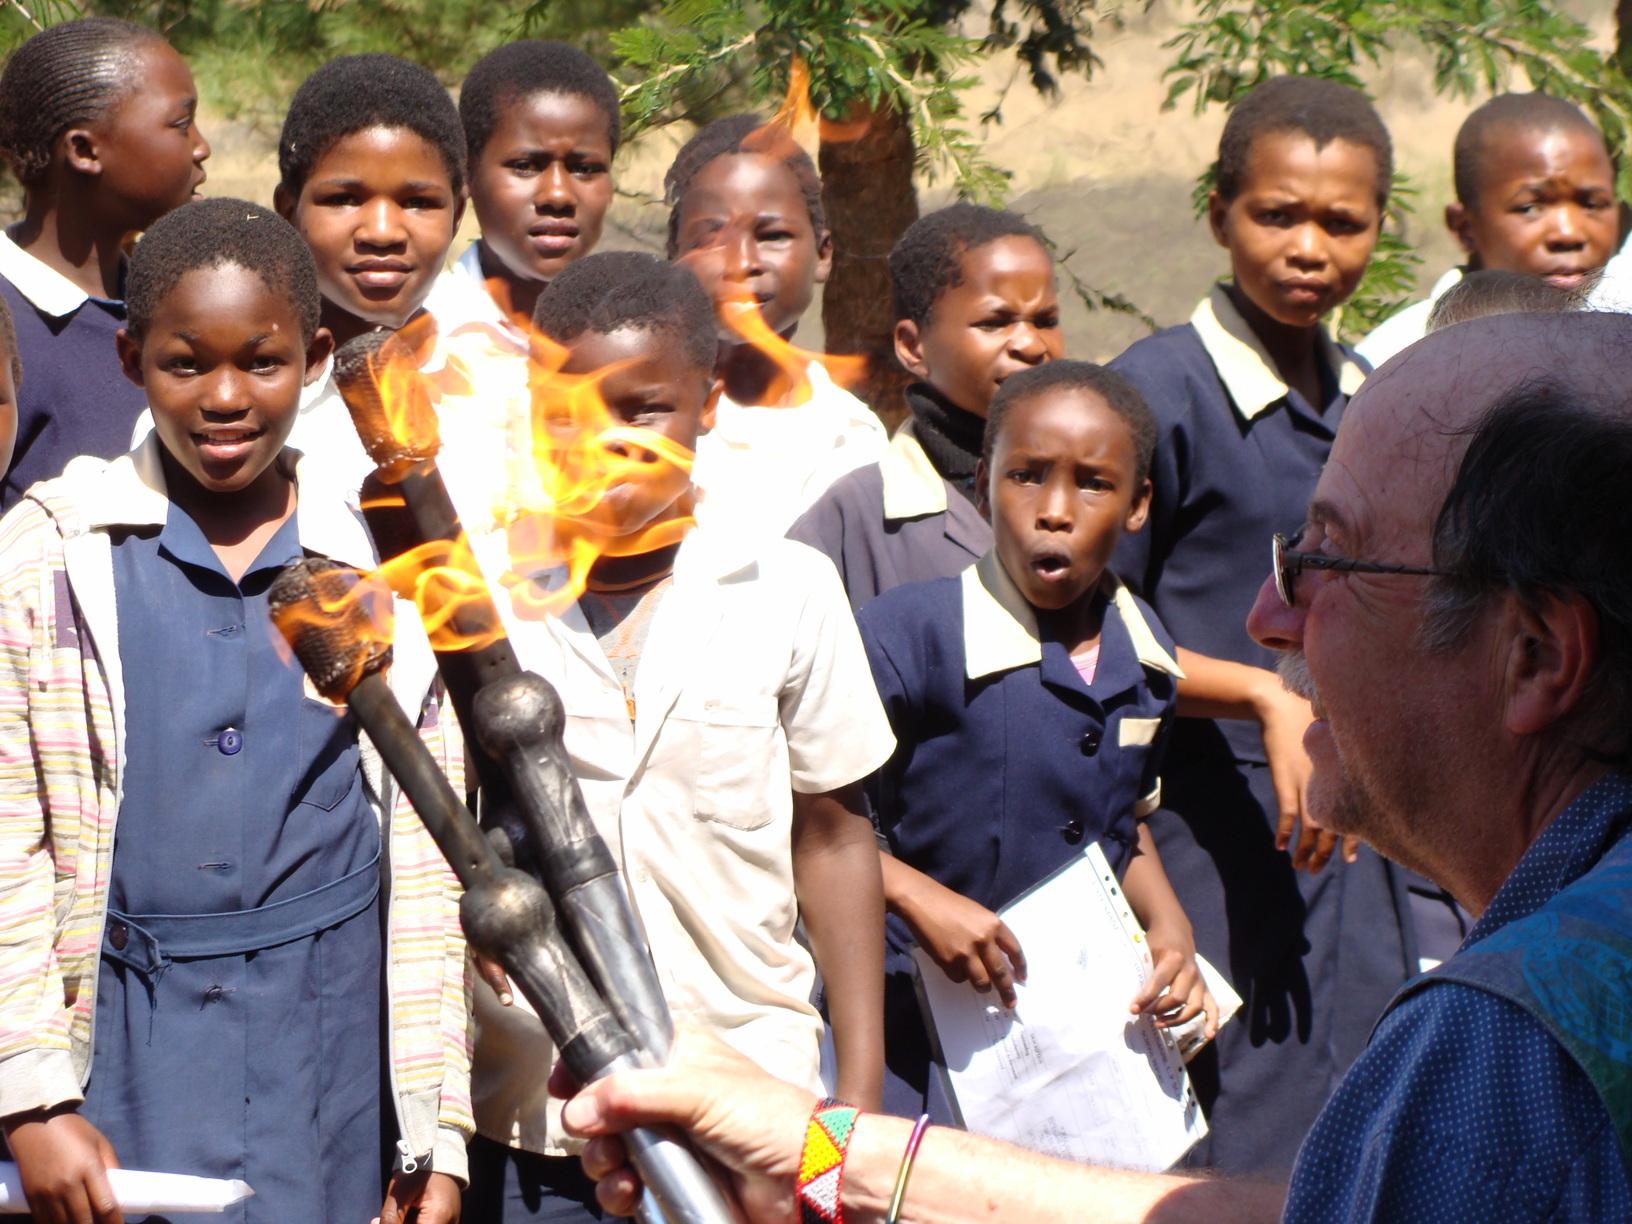 Annual Sangoma ceremony in Zululand /static/Zulu/fireclubs.jpg